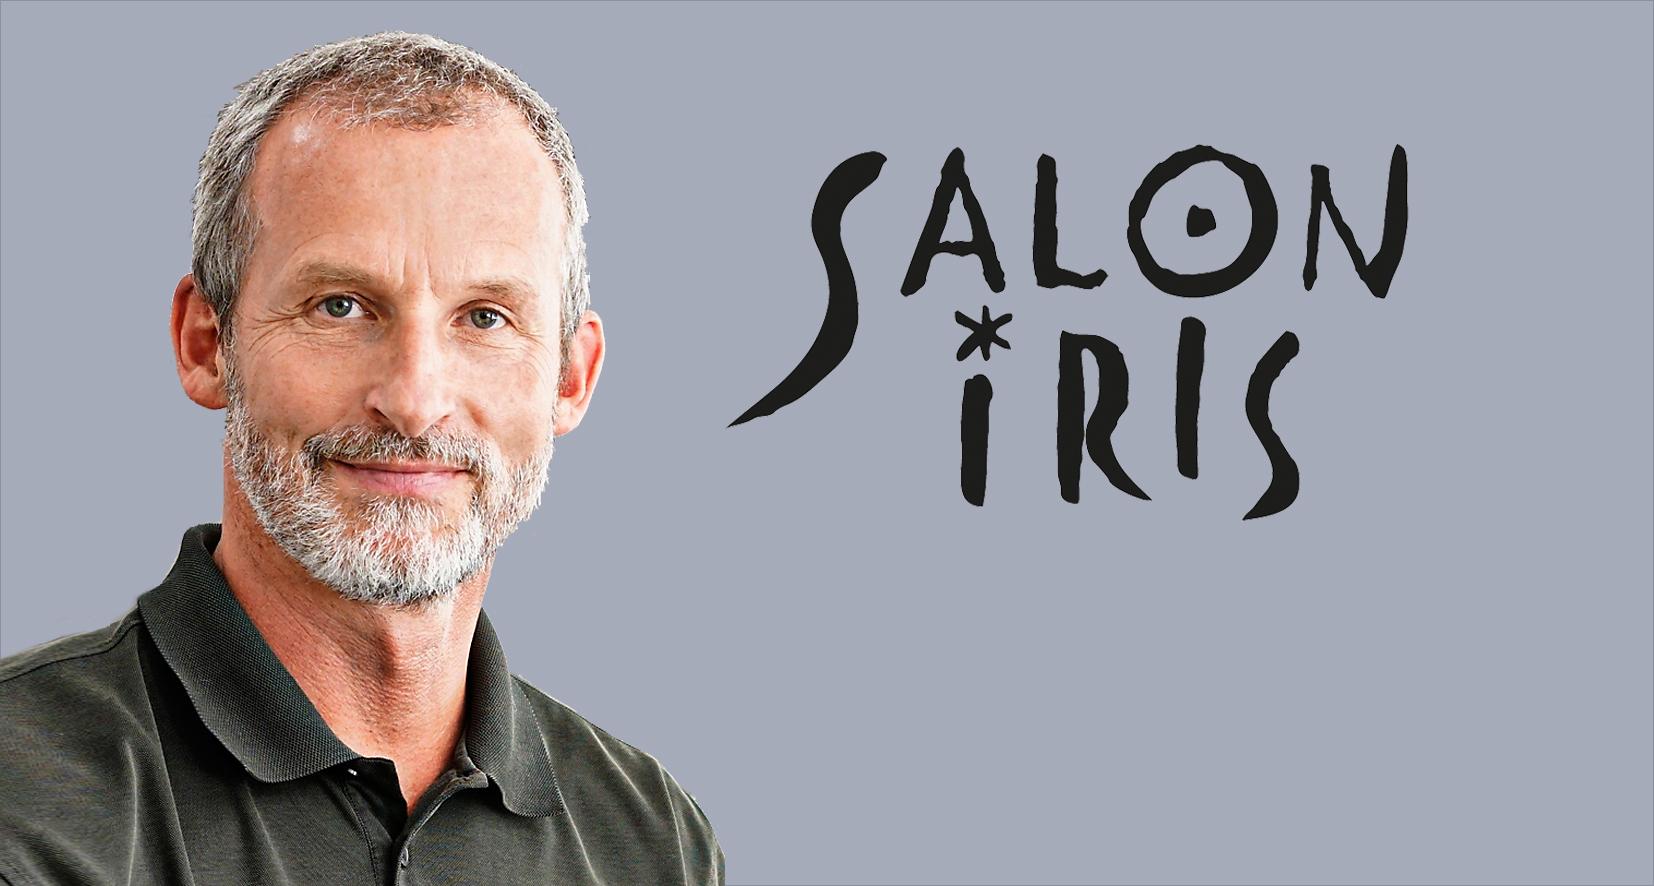 Salon Iris: fine art print – quality instead of quantity